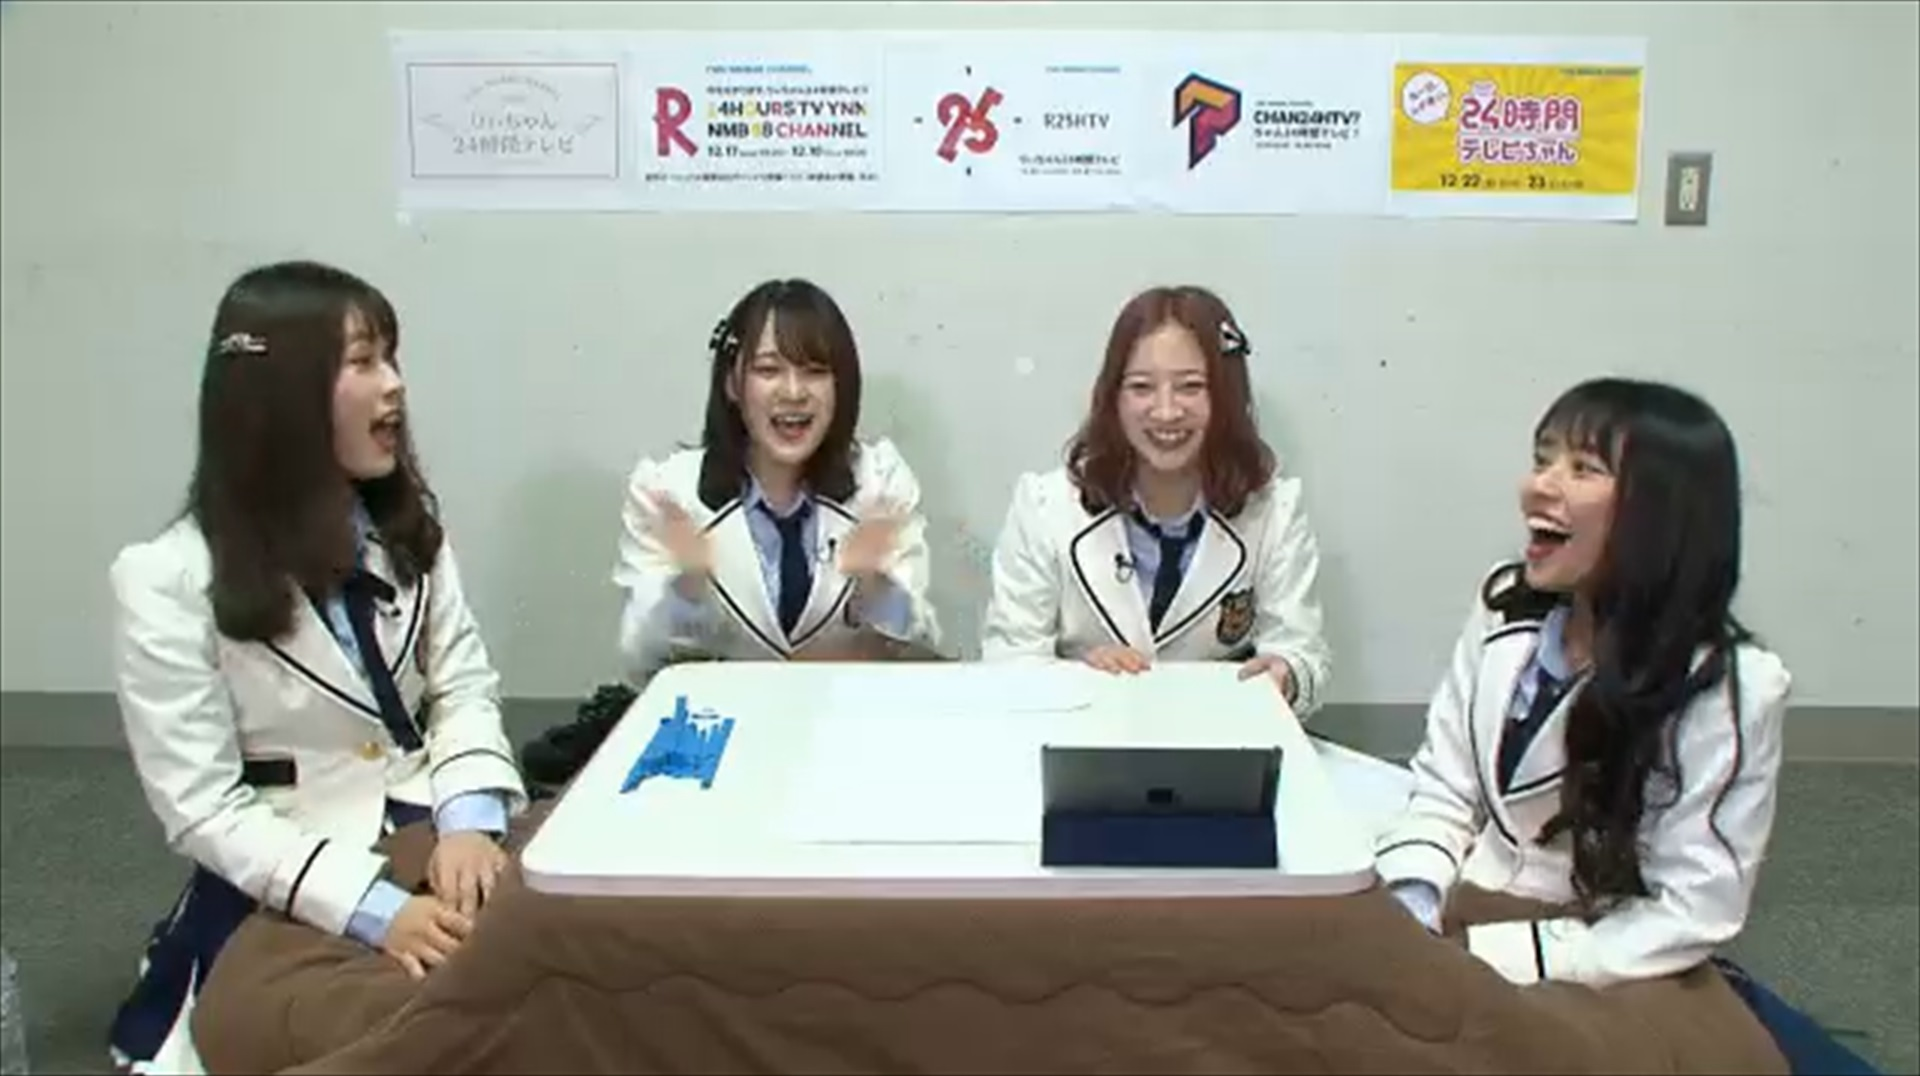 【NMB48】難波新年!24時間ガールのメインMCは渋谷凪咲・山尾梨奈、タイムテーブルも全発表!60分ガールキャプ画像。